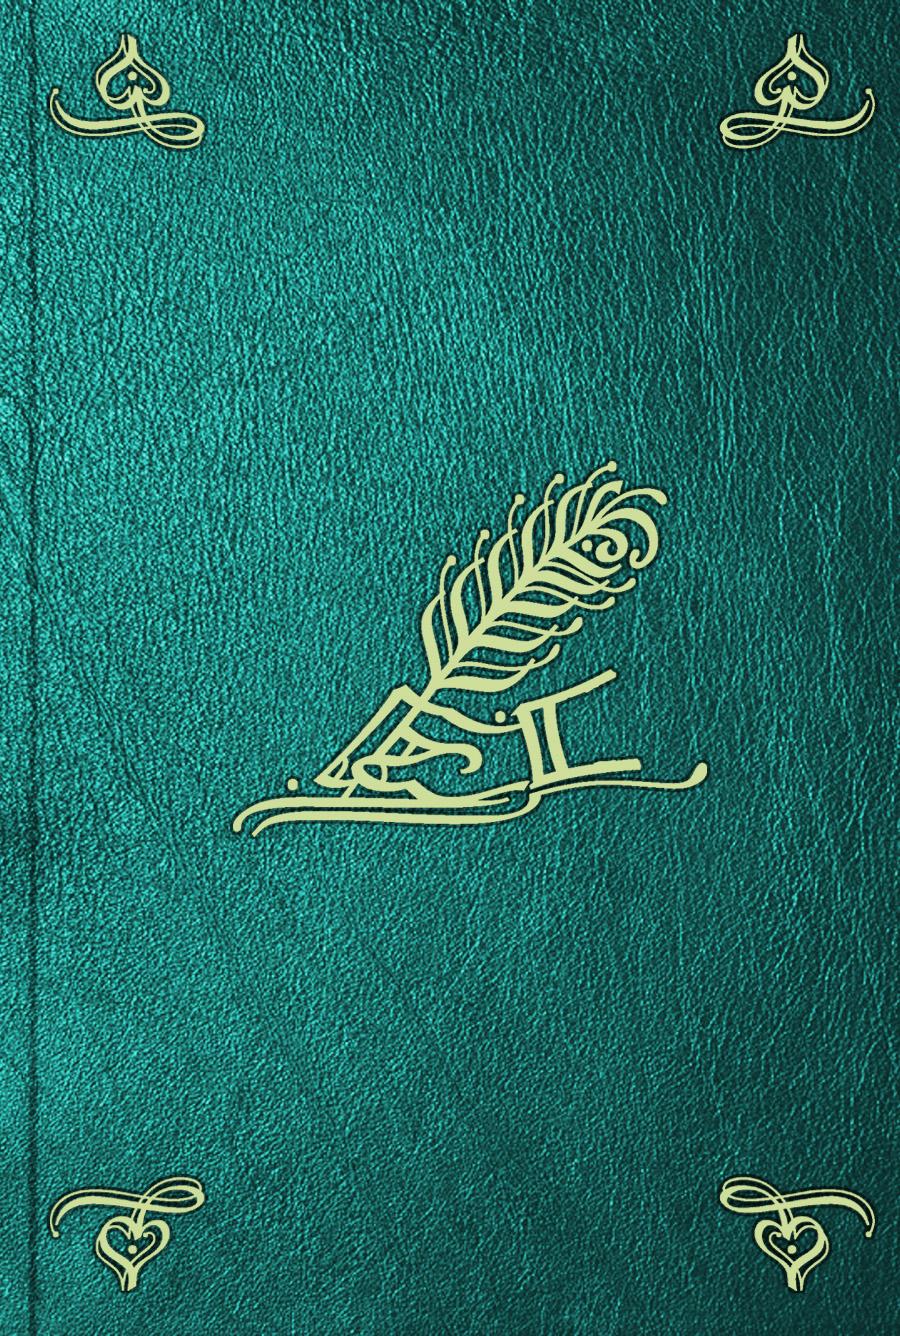 Lucy Hutchinson Memoires de Mistriss Hutchinson. T. 2 victorinox 31174001